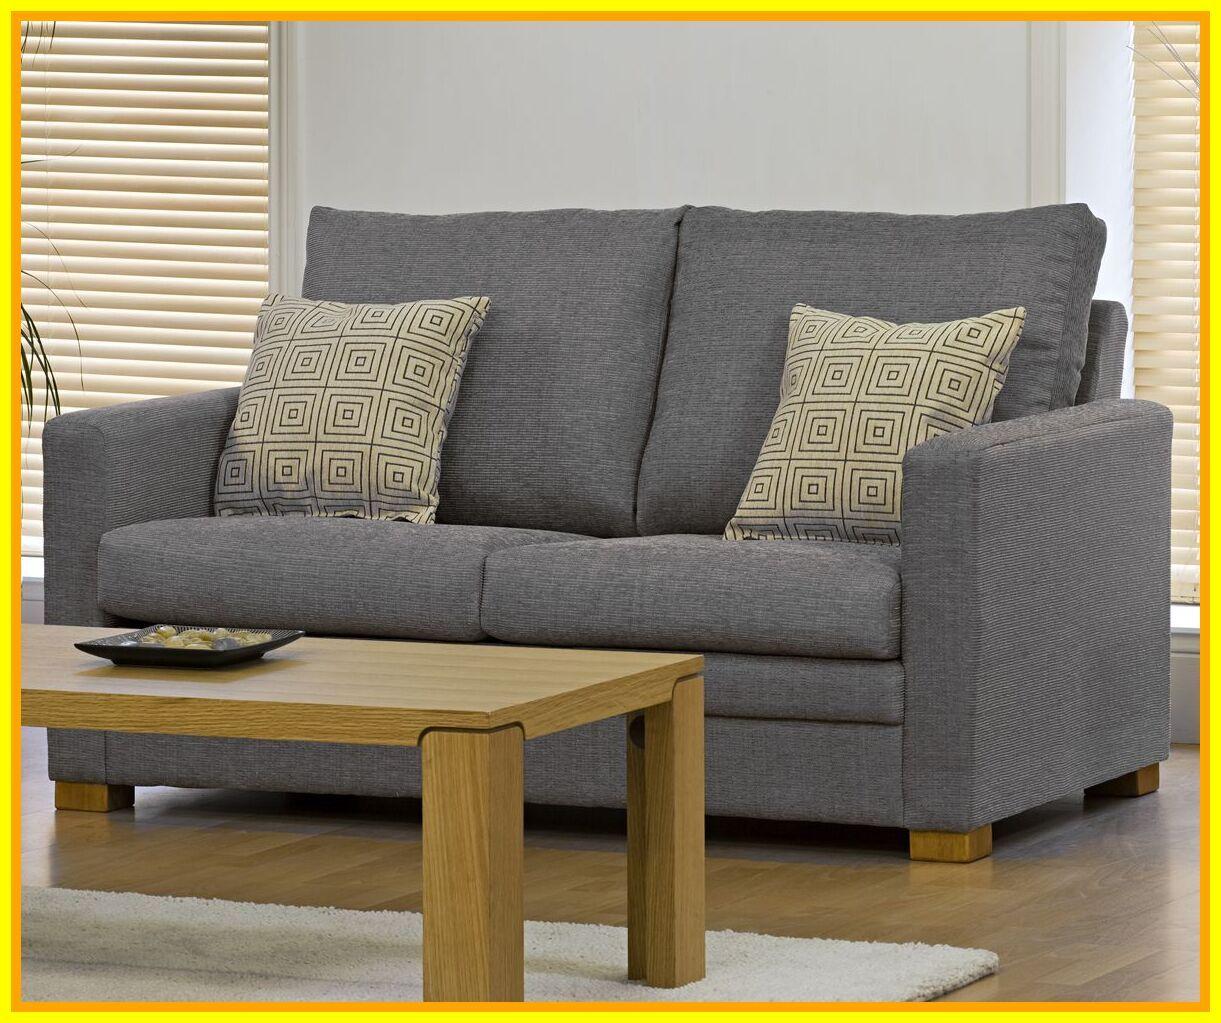 38 Reference Of Small Grey Sofa Beds Uk In 2020 Sofa Bed Uk Grey Sofa Bed Corner Sofa Uk